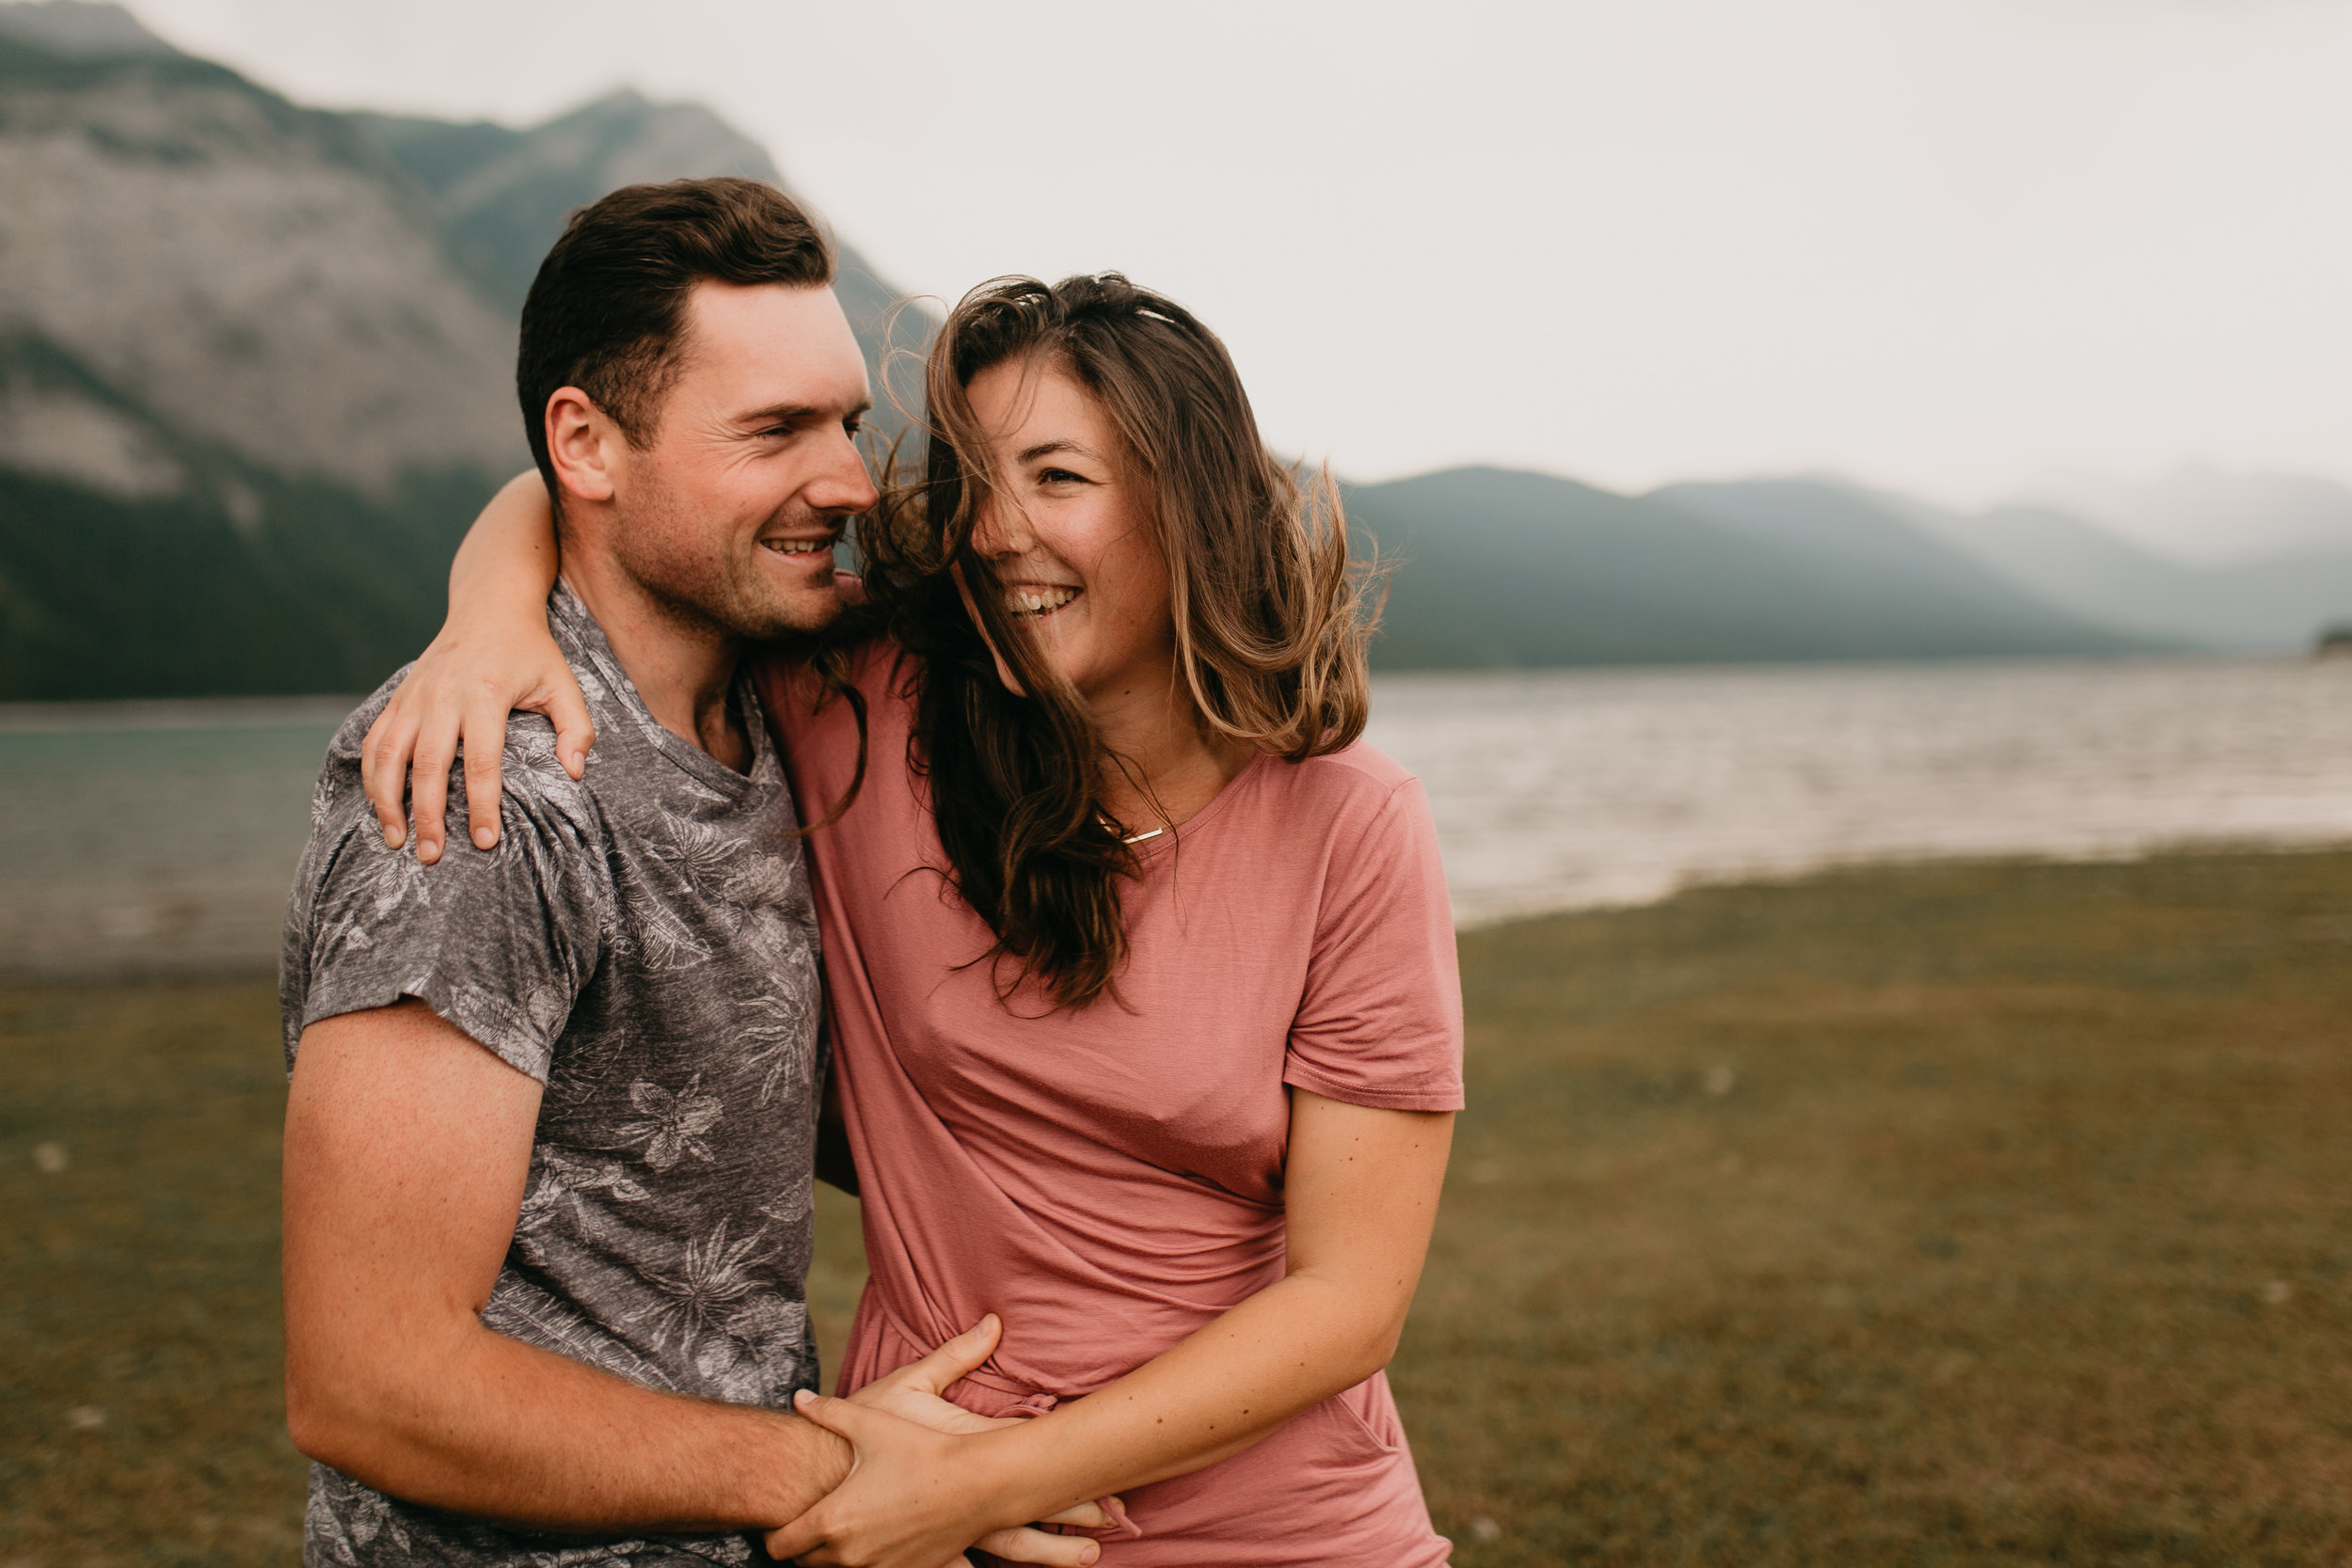 nicole-daacke-banff-kananaskis-alberta-canada-adventure-elopement-photographer-adventure-session-in-the-mountains-photographer-5.jpg